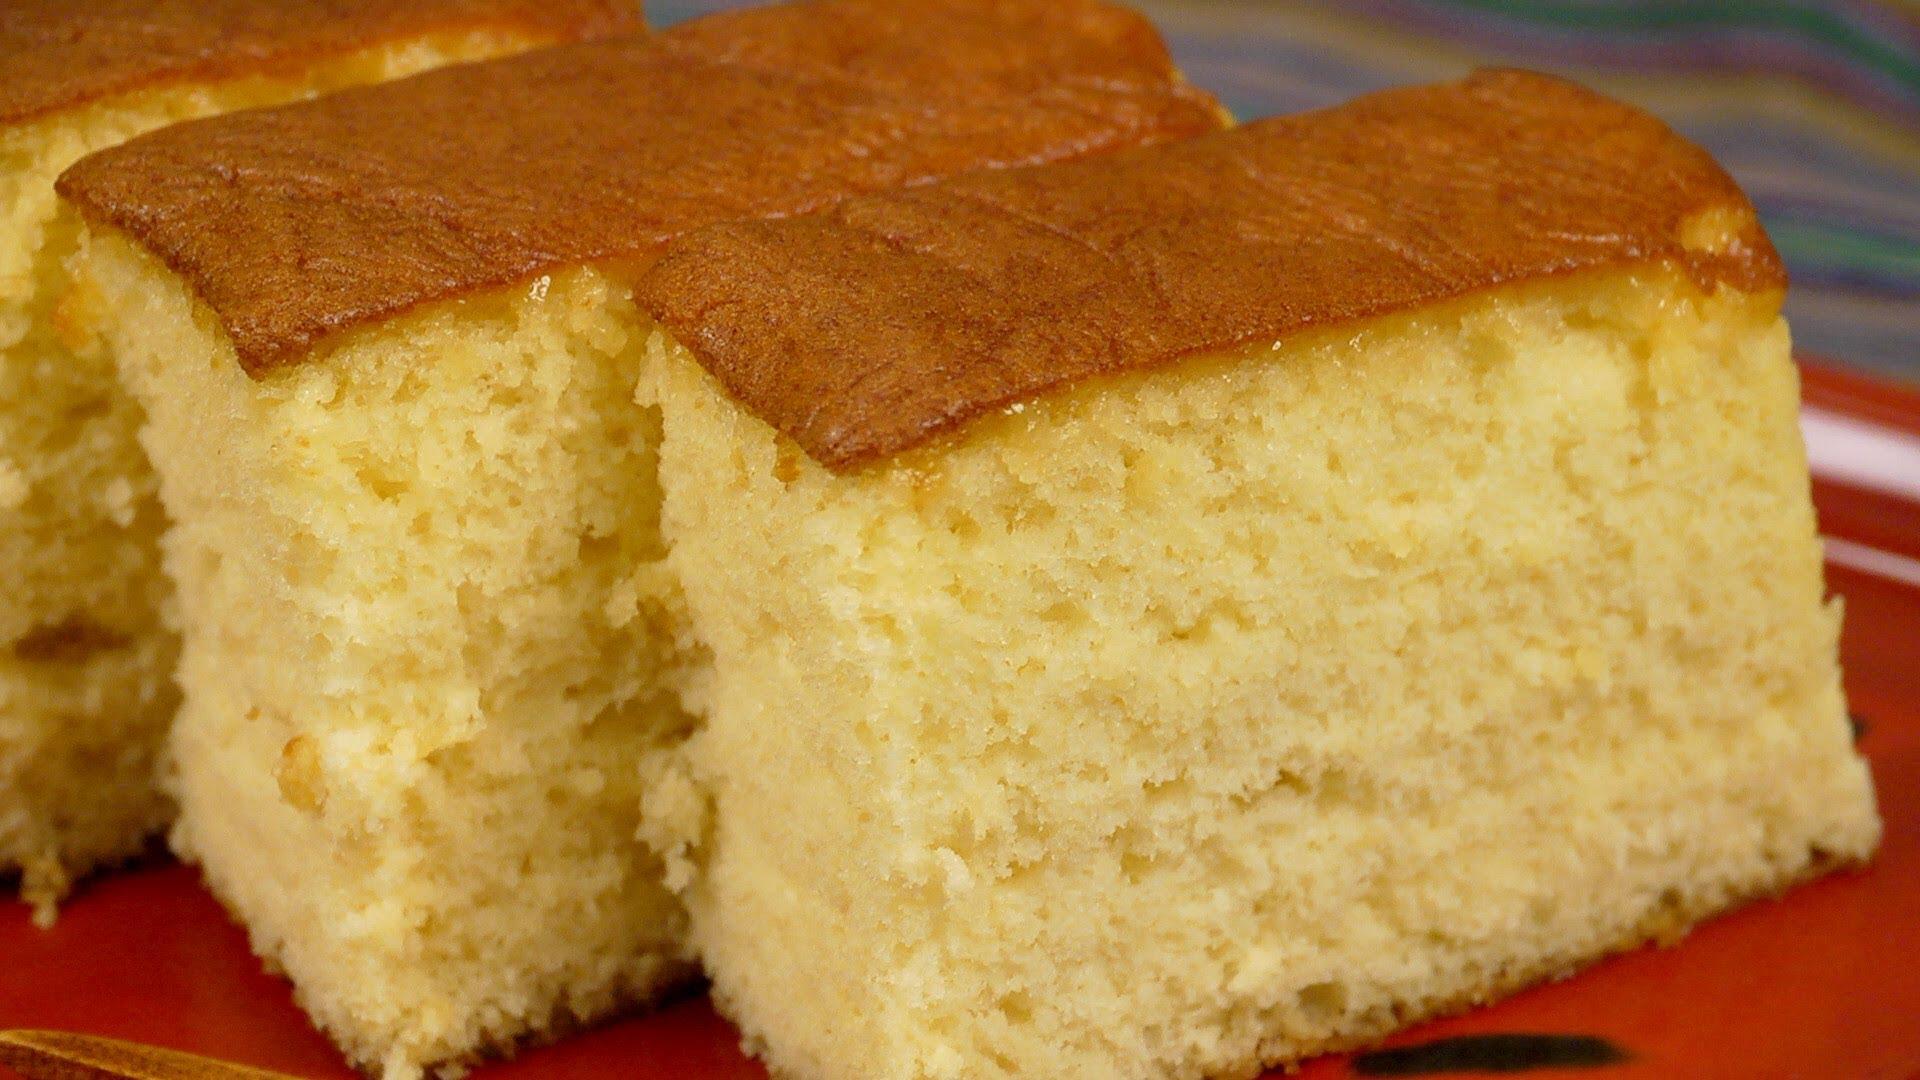 How to Make Kasutera Sponge Cake